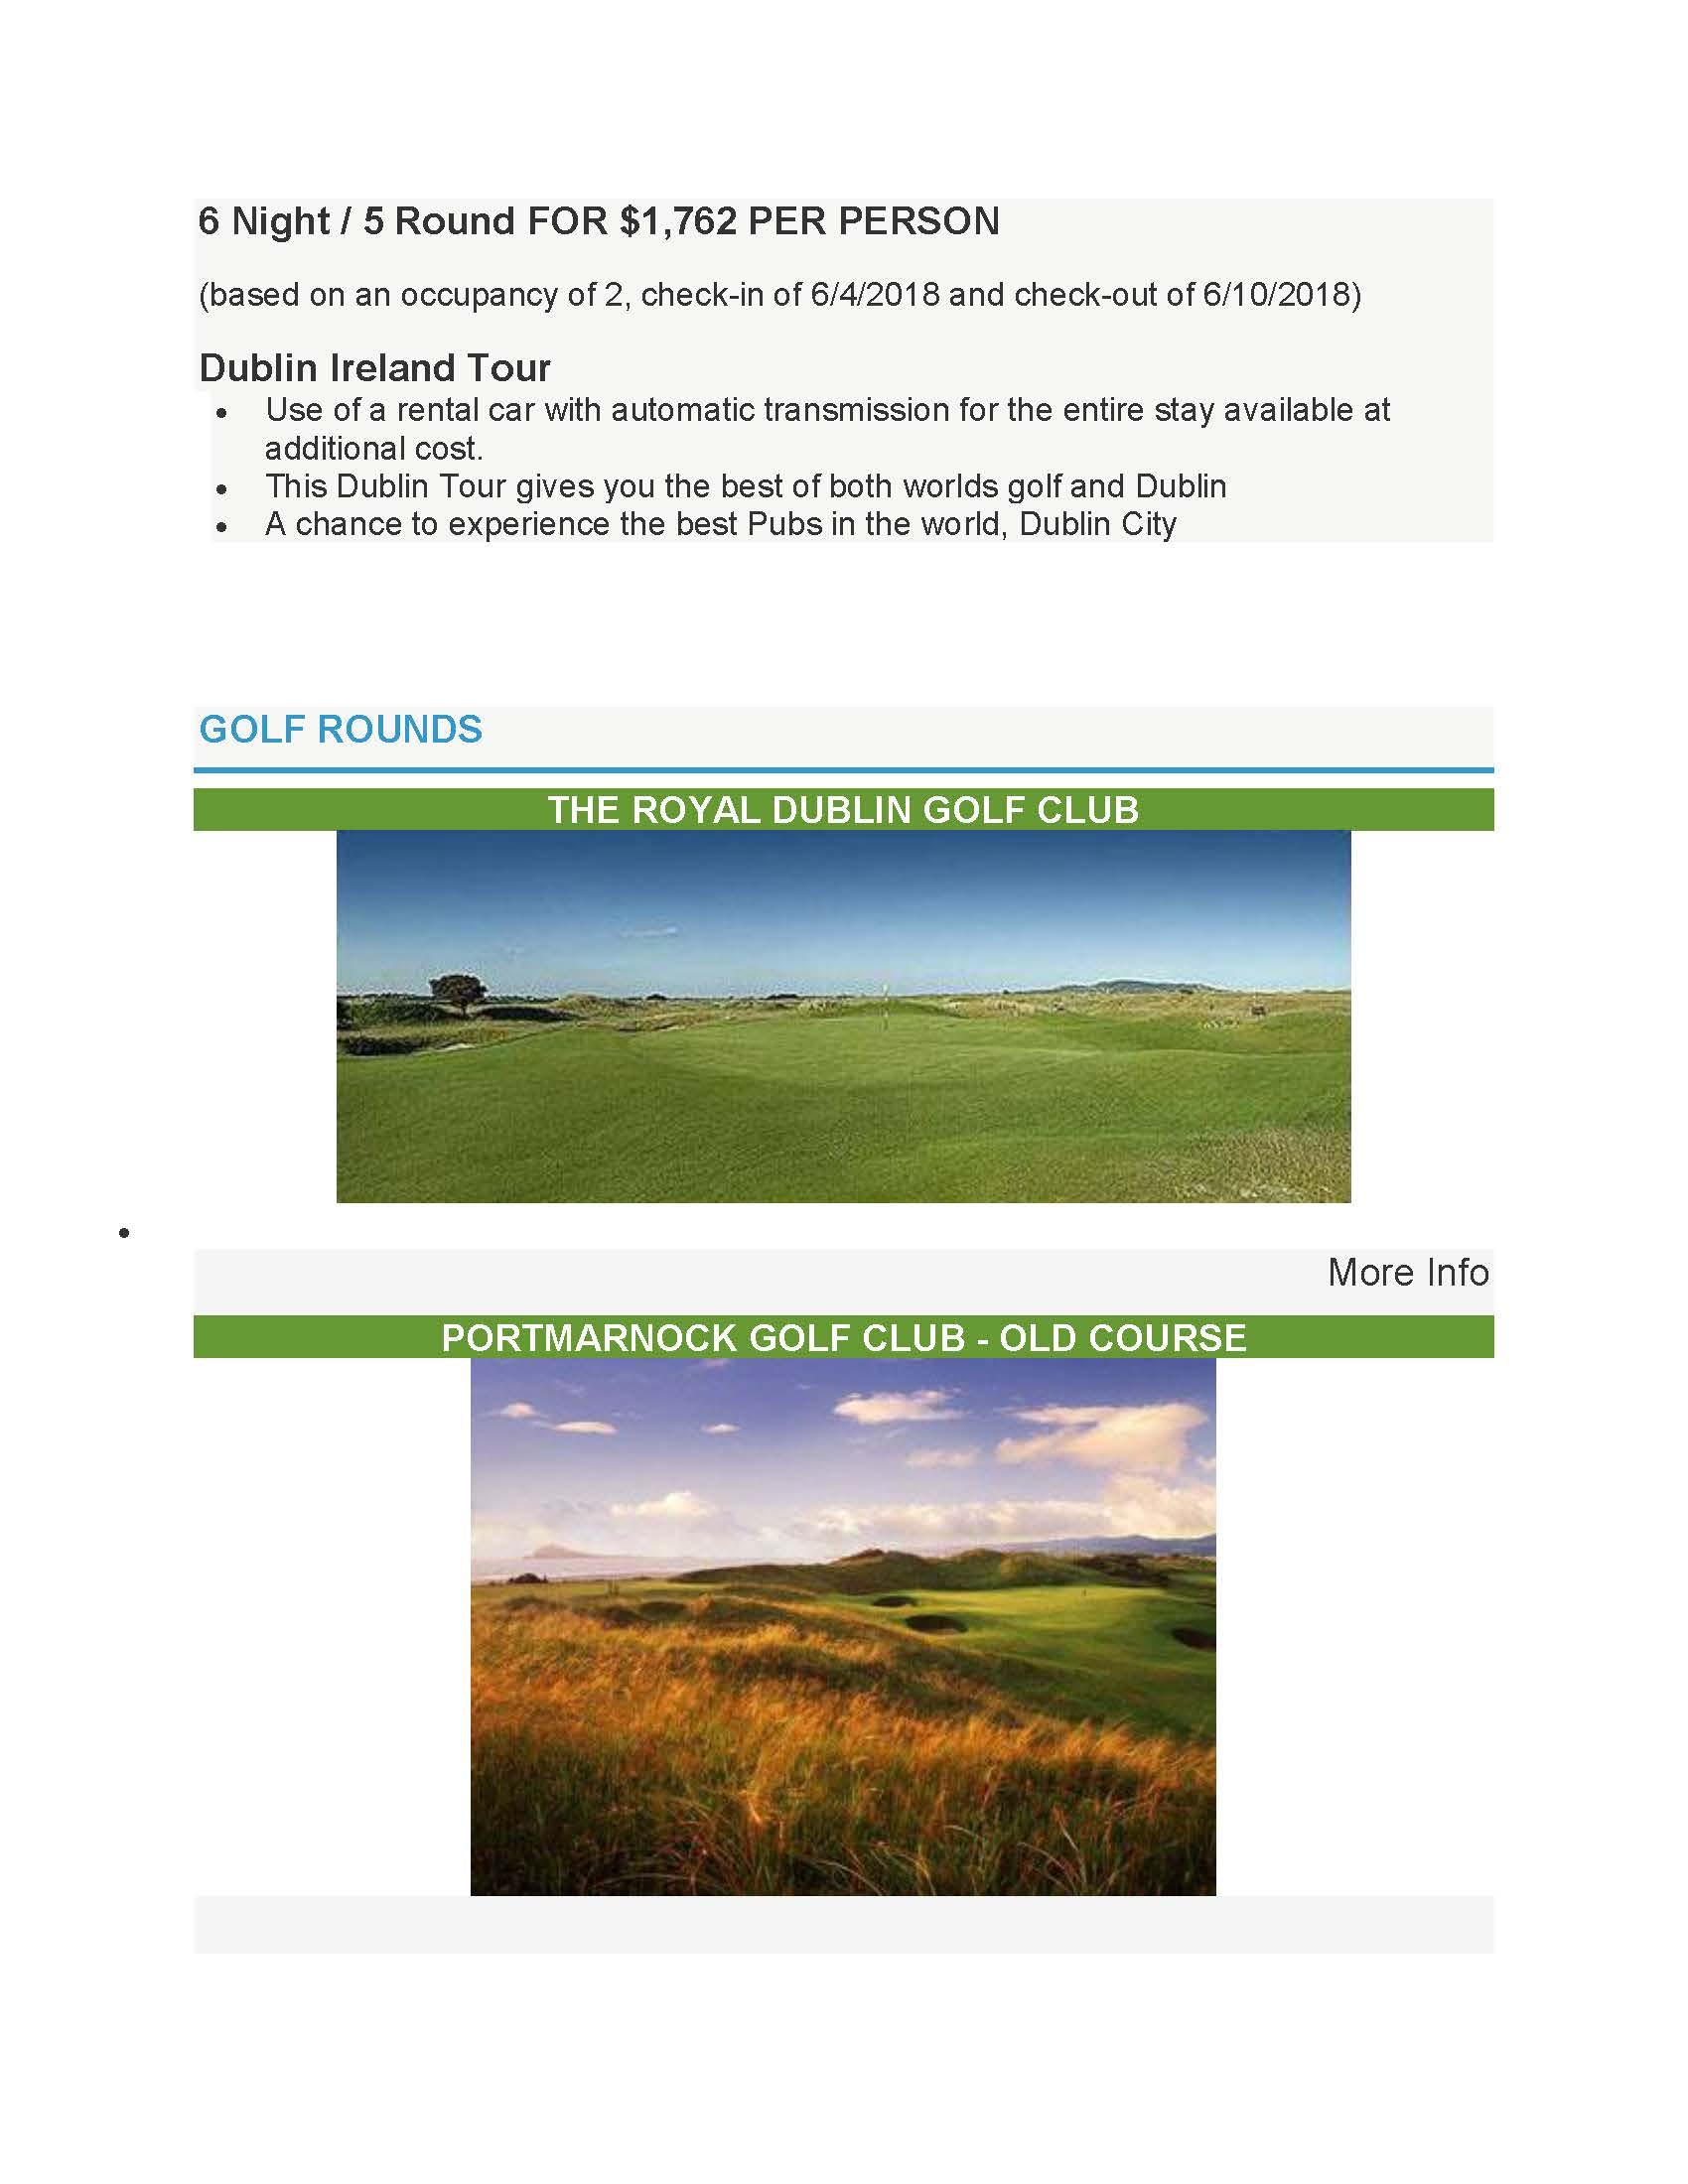 Dublin Ireland Tour Golf Edited_Page_1.jpg